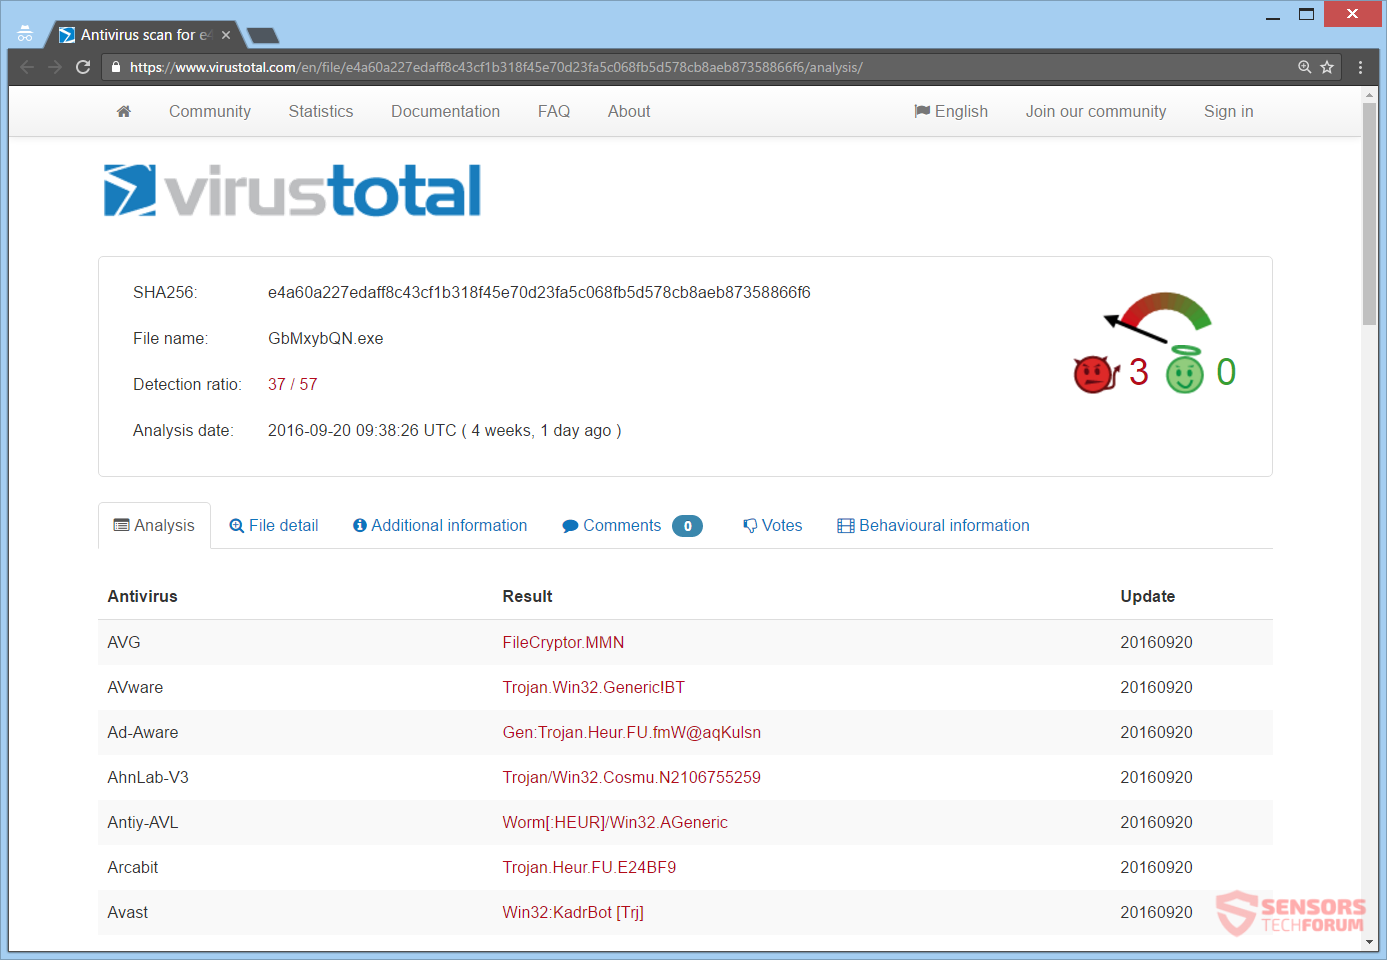 stf-rotor-ransomware-cocoslim98-gmail-com-virus-total-analysis-trojan-ransom-win32-rotor